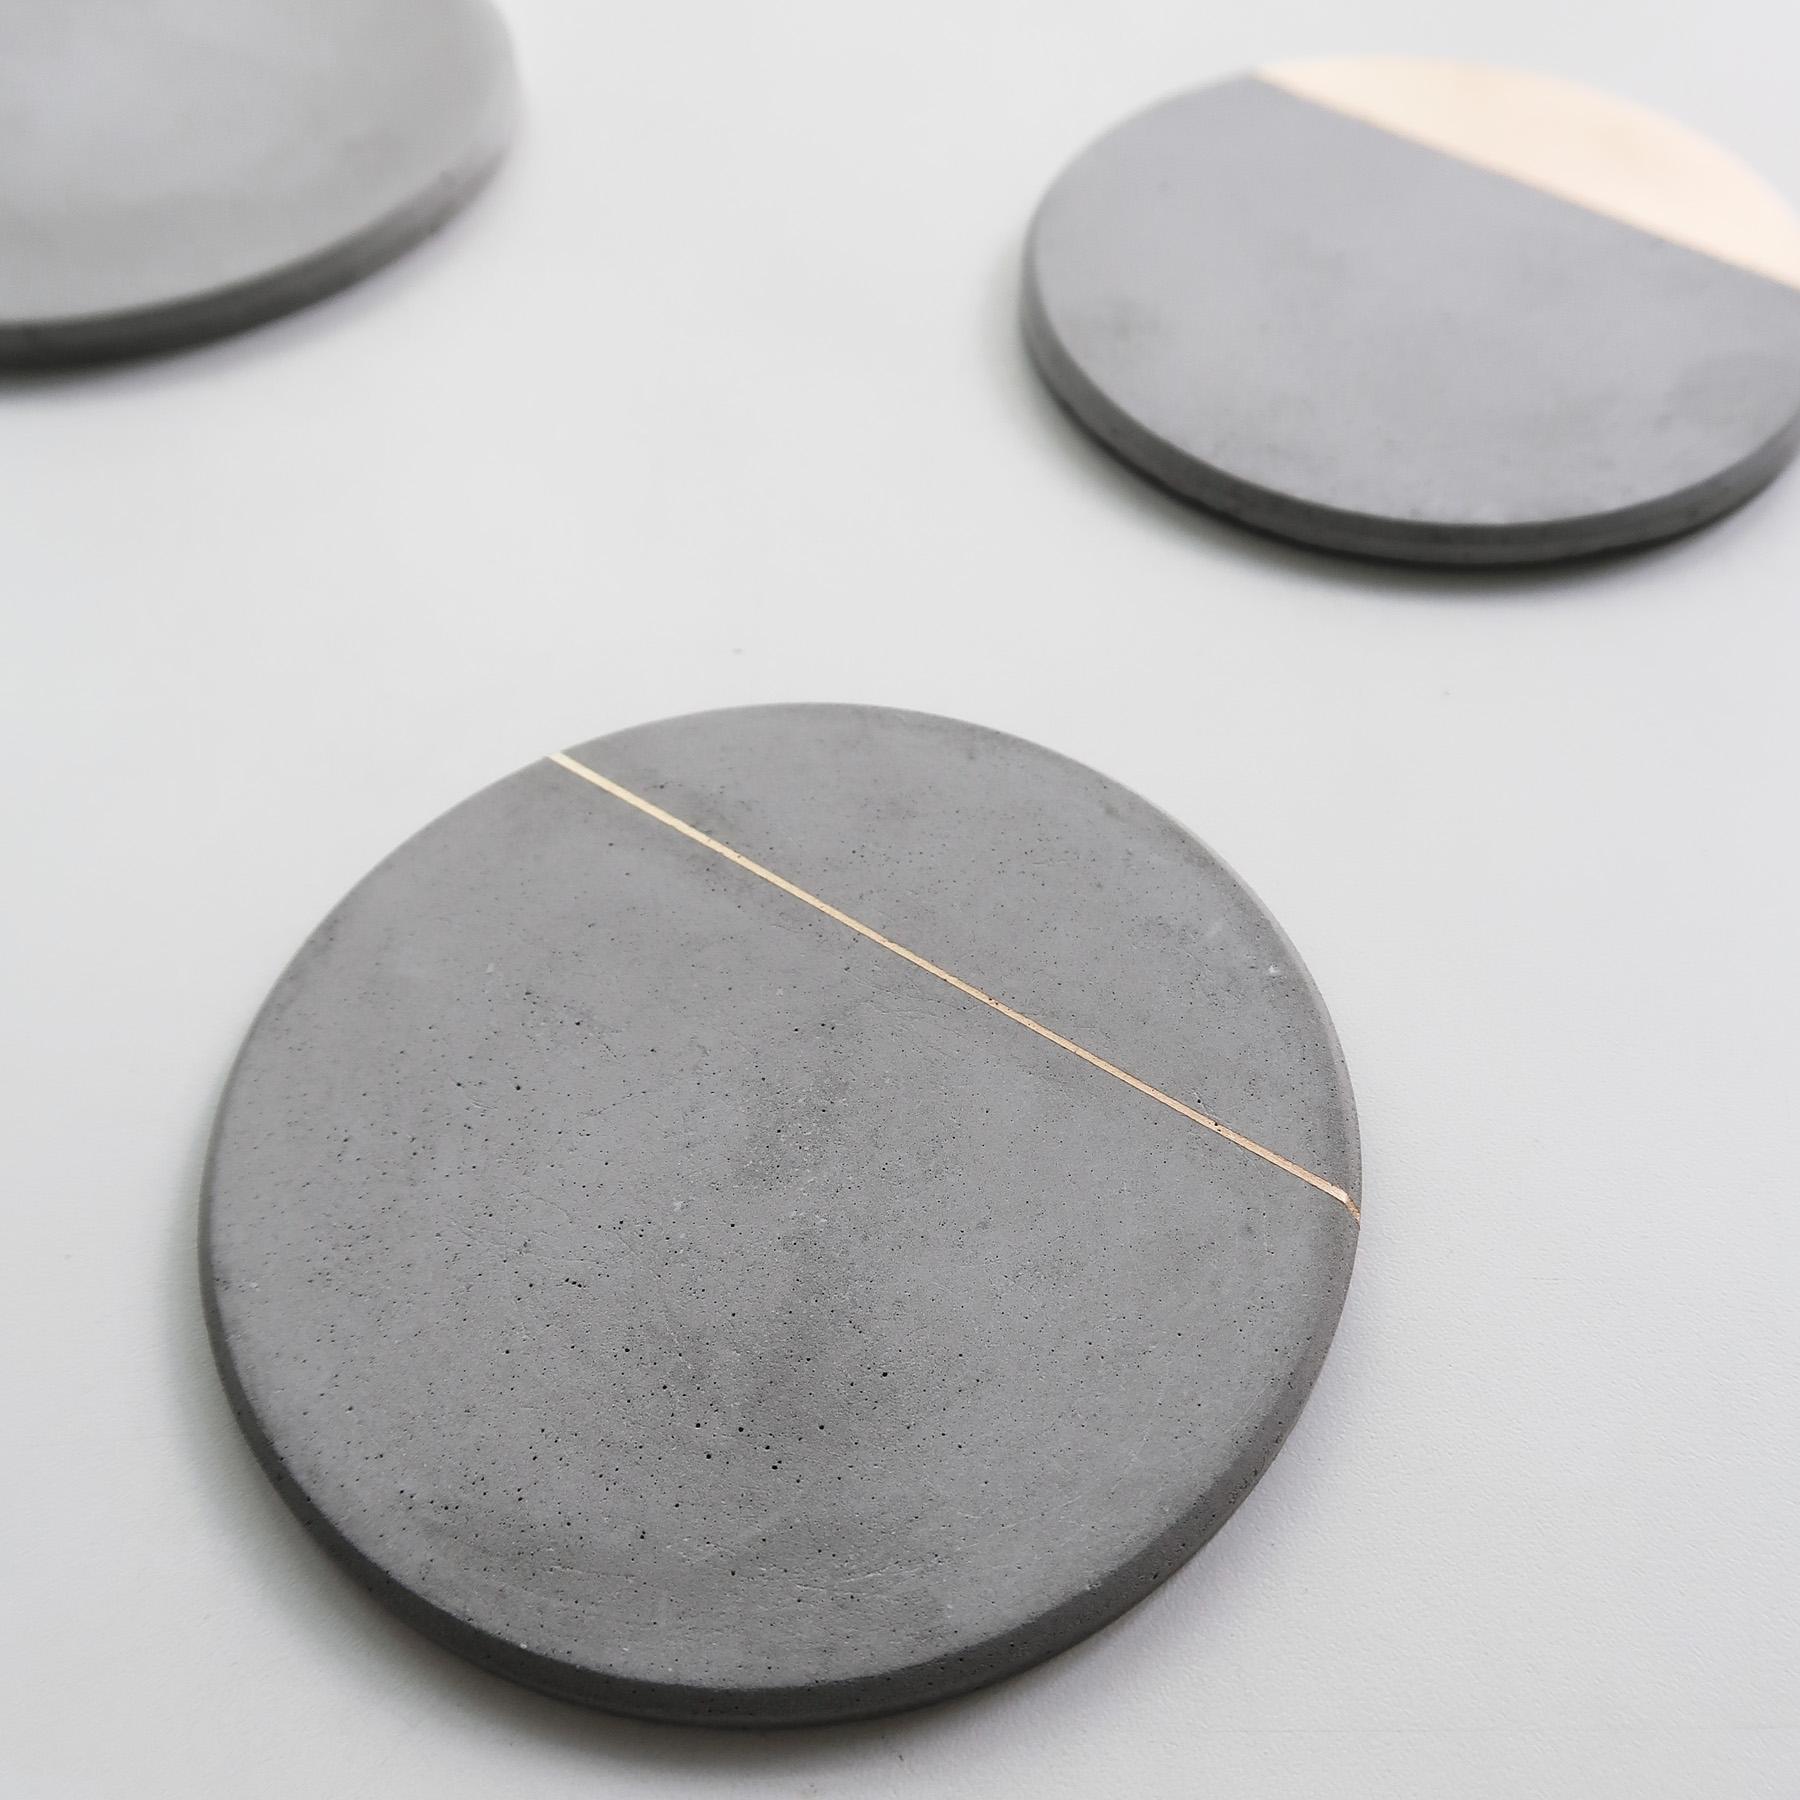 Concrete Design 曙光金線倒角設計水泥吸水圓墊・杯墊・飾品盤